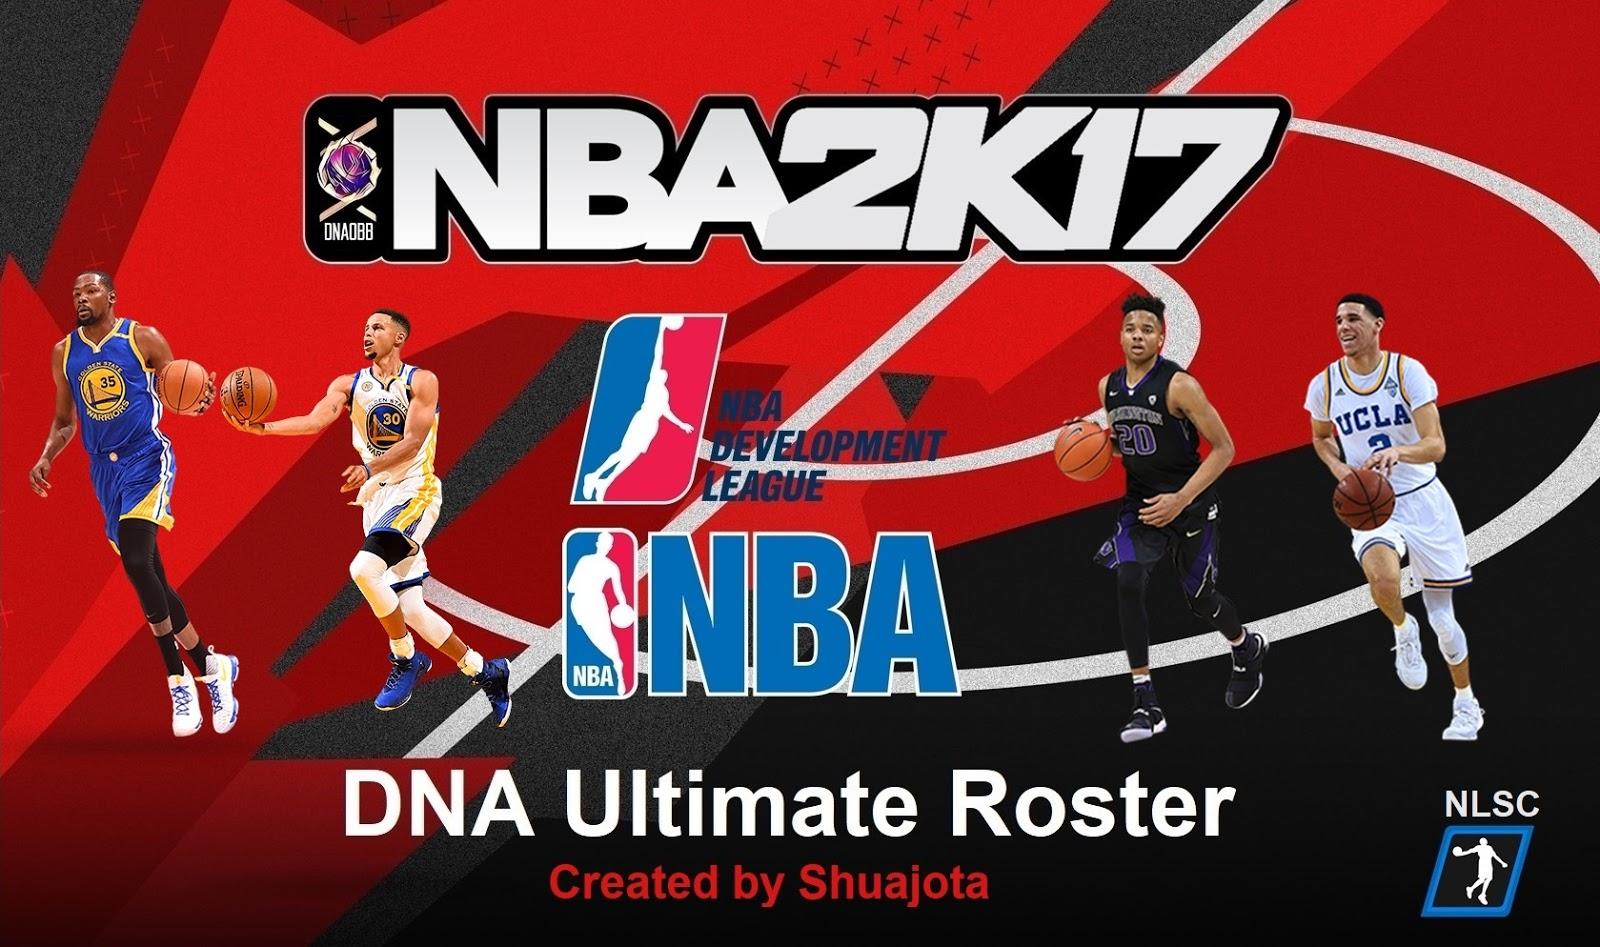 Shuajota | Your Videogame to the Next Level: NBA 2K17 DNA